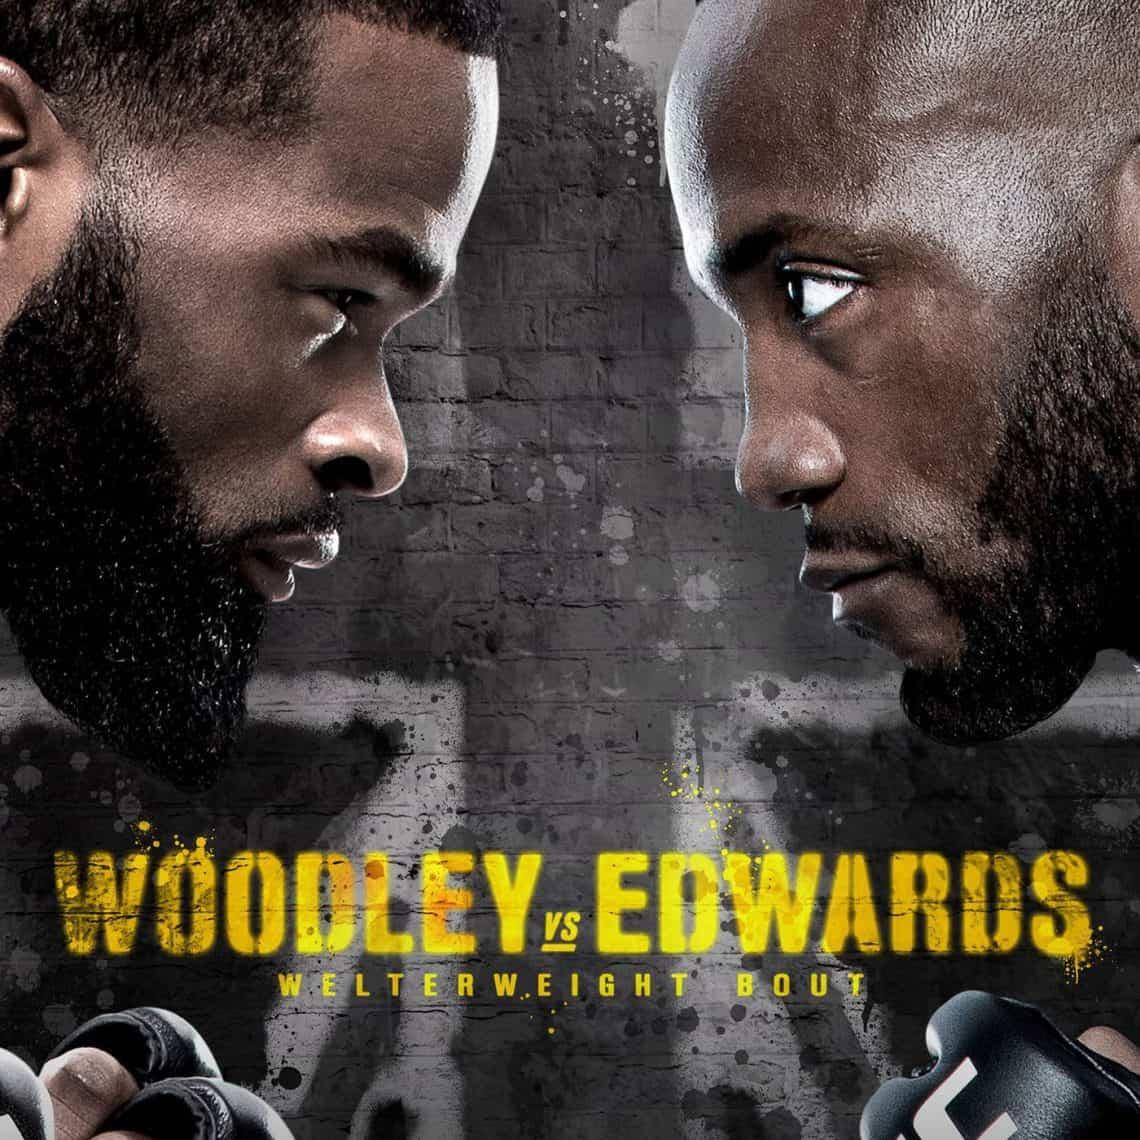 UFC Fight Night 171: Woodley vs. Edwards (con Marvin Vettori) 1